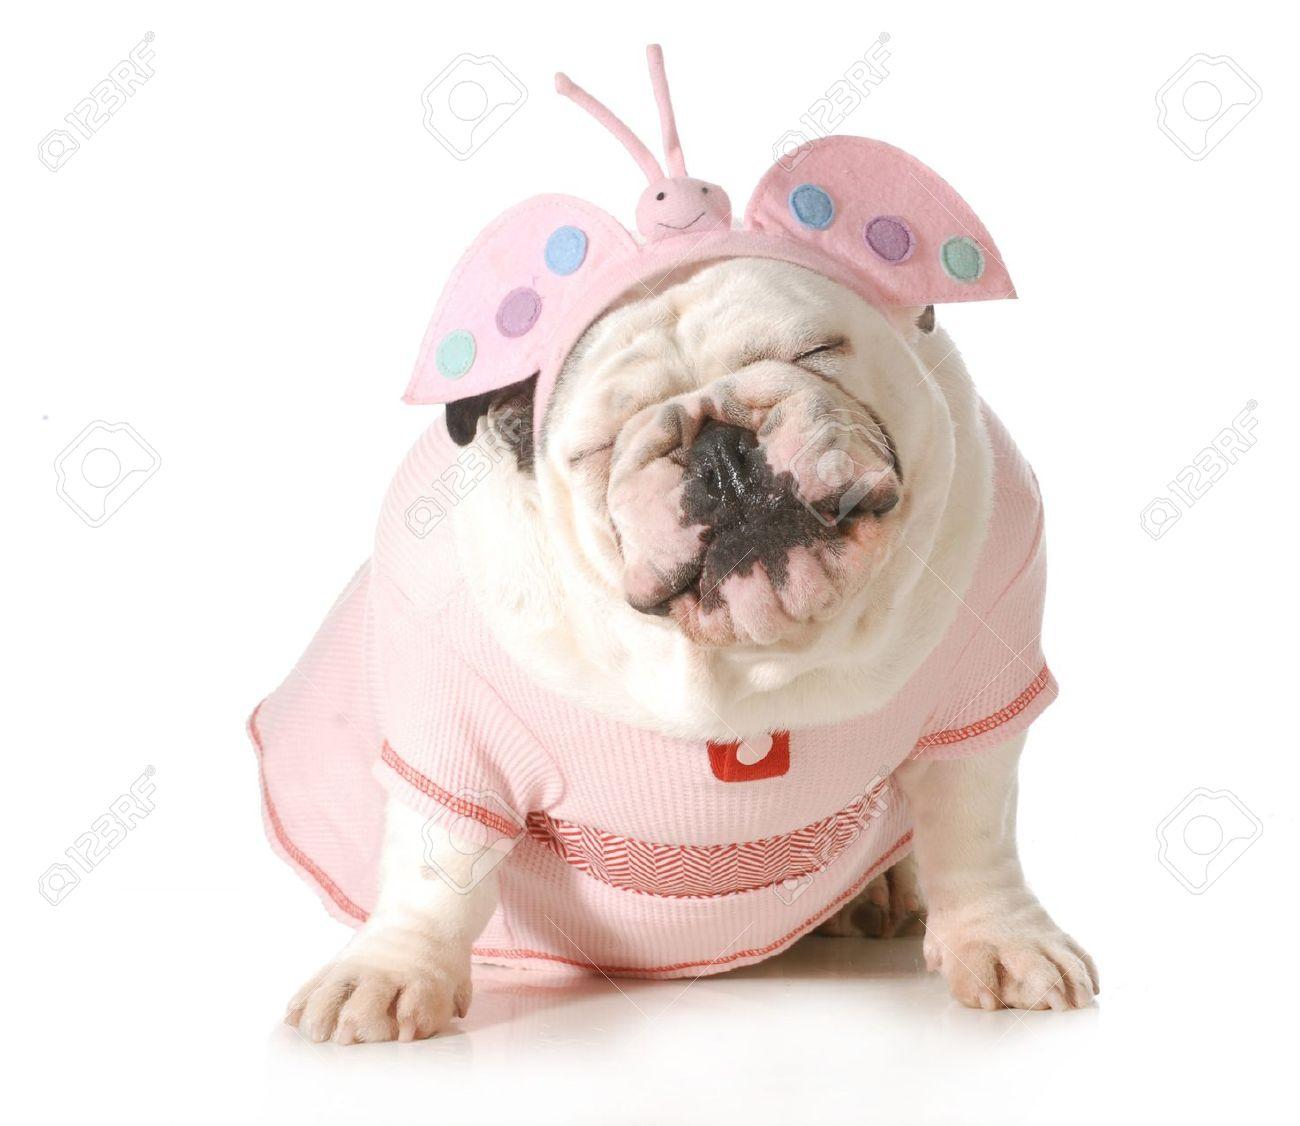 English Bulldog Stock Photos Images. Royalty Free English Bulldog.